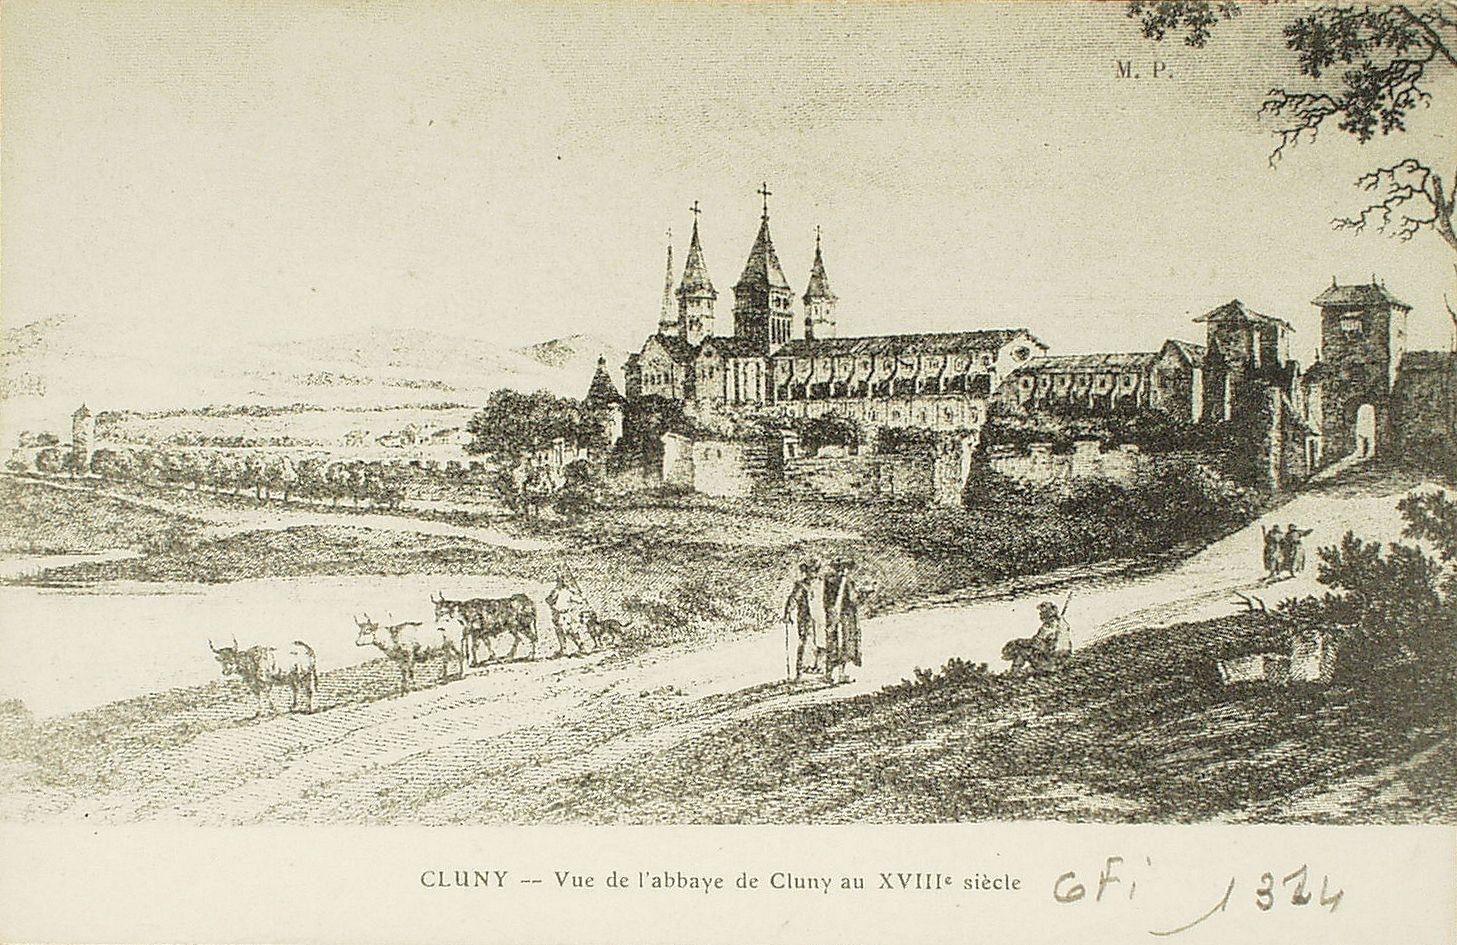 Cluny -  Cluny. Vue de l'abbaye de Cluny au XVIIIe s.